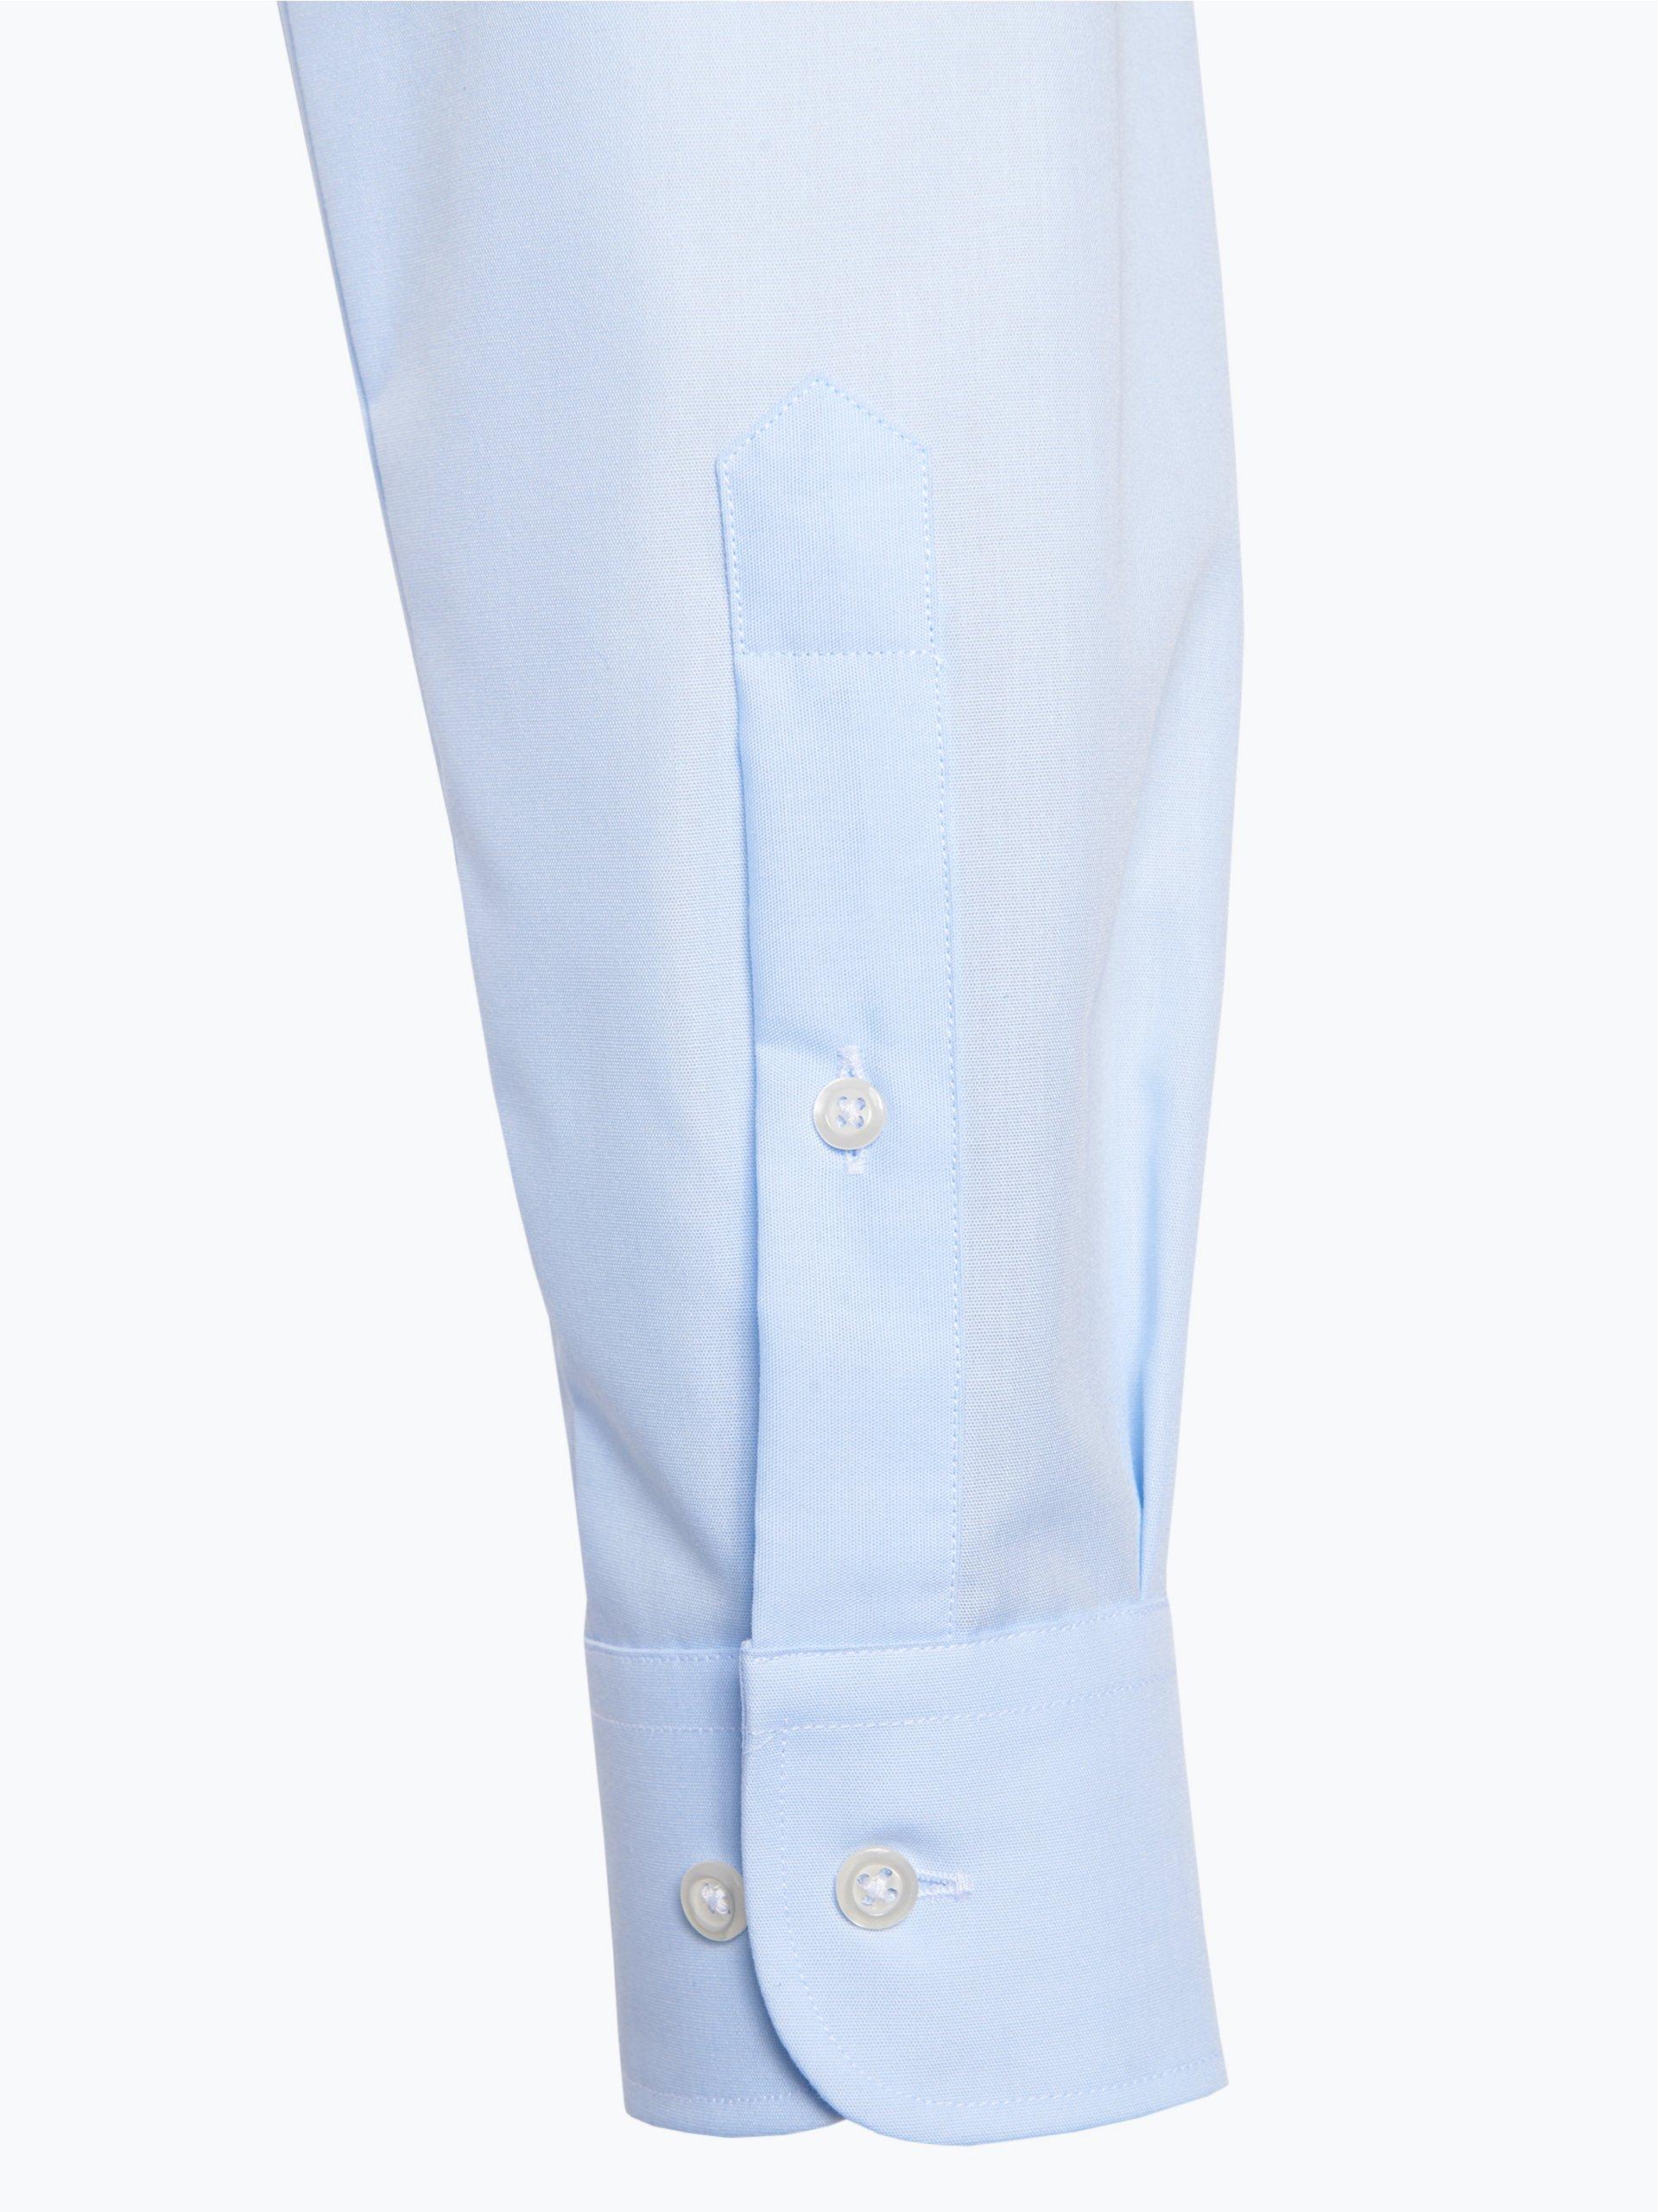 Eterna Slim Fit Herren Hemd Bügelfrei